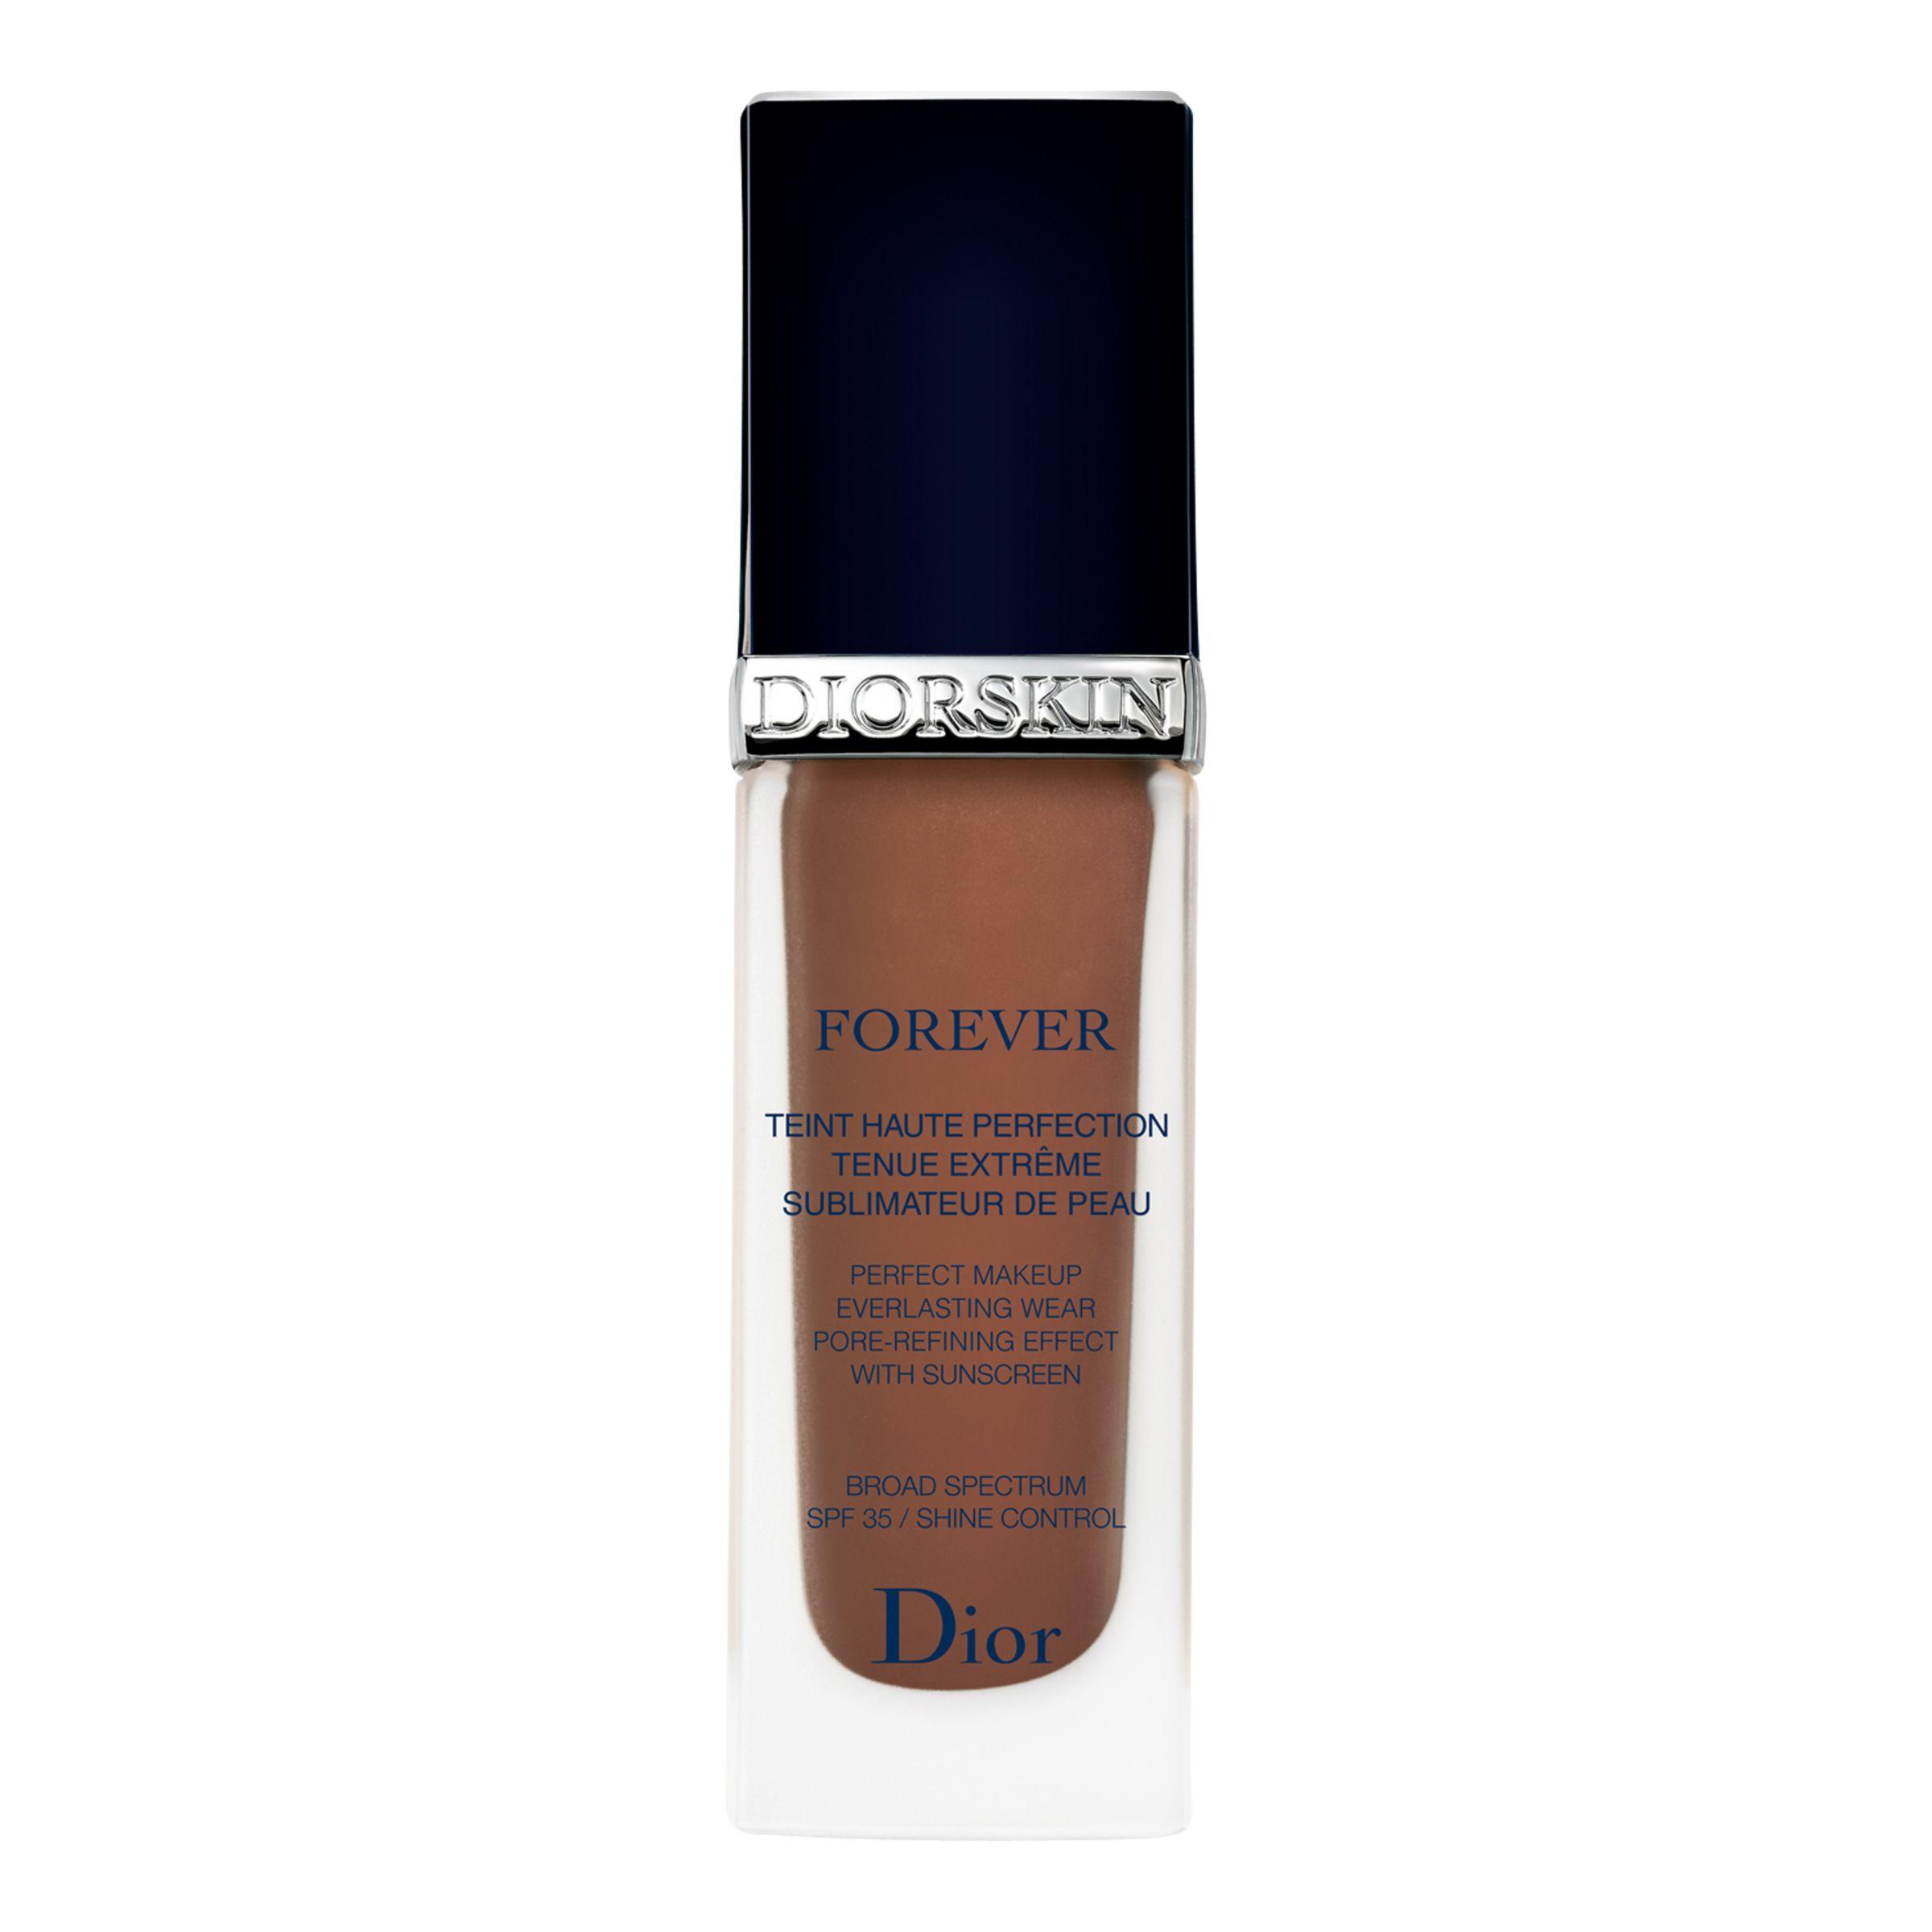 Dior Diorskin Forever Fluid Foundation Ebony 080 At John Lewis Partners